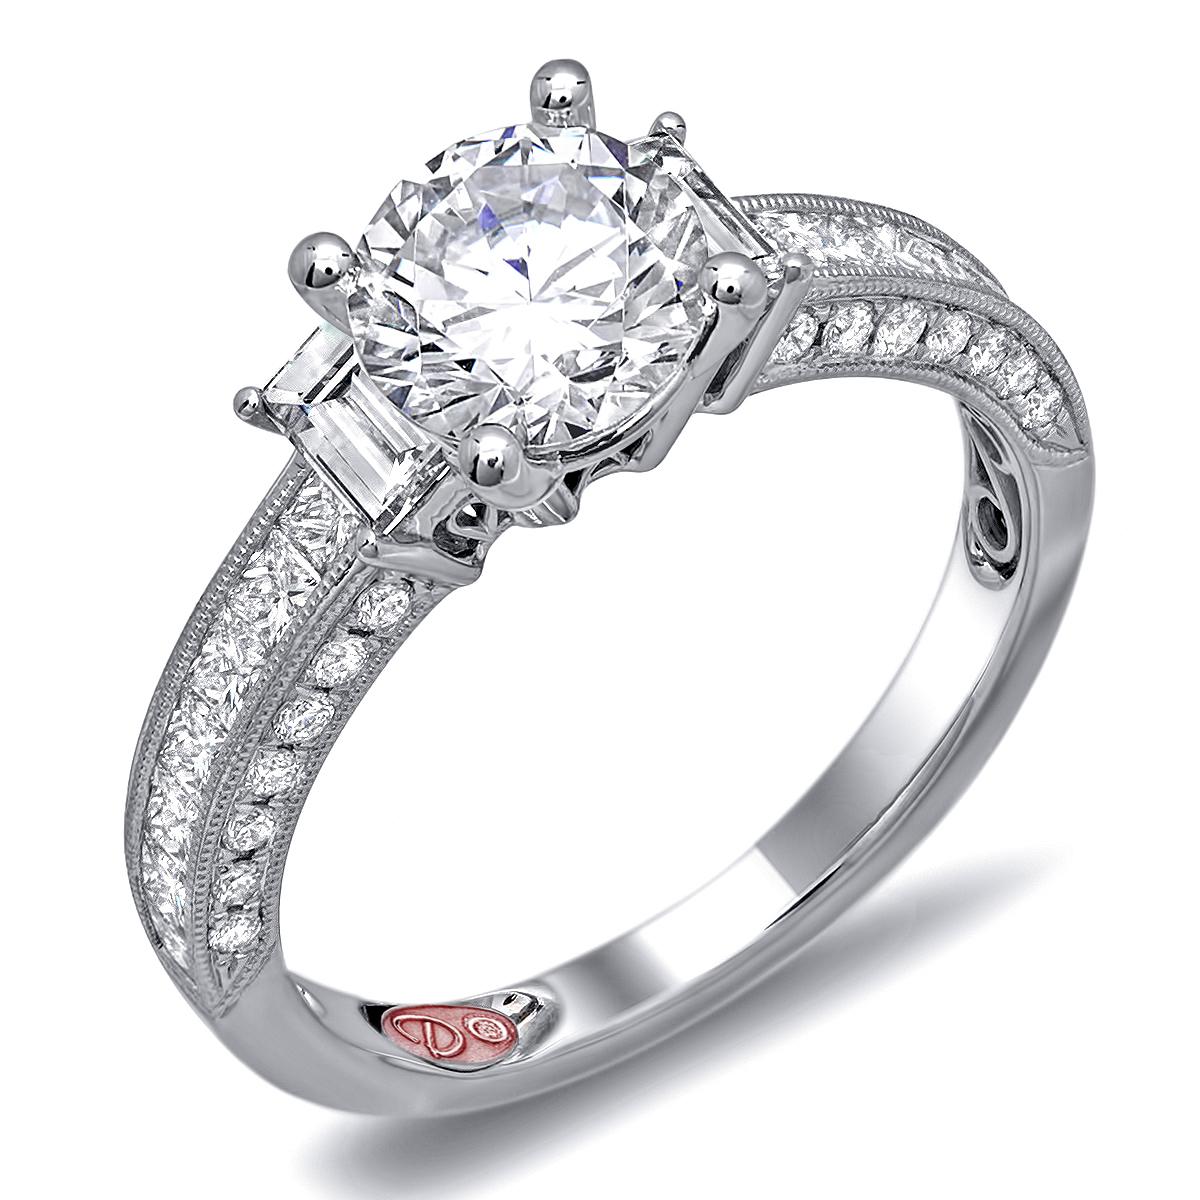 Unicorn Jewelry Watch Boutique Unique Engagement Rings DW6129